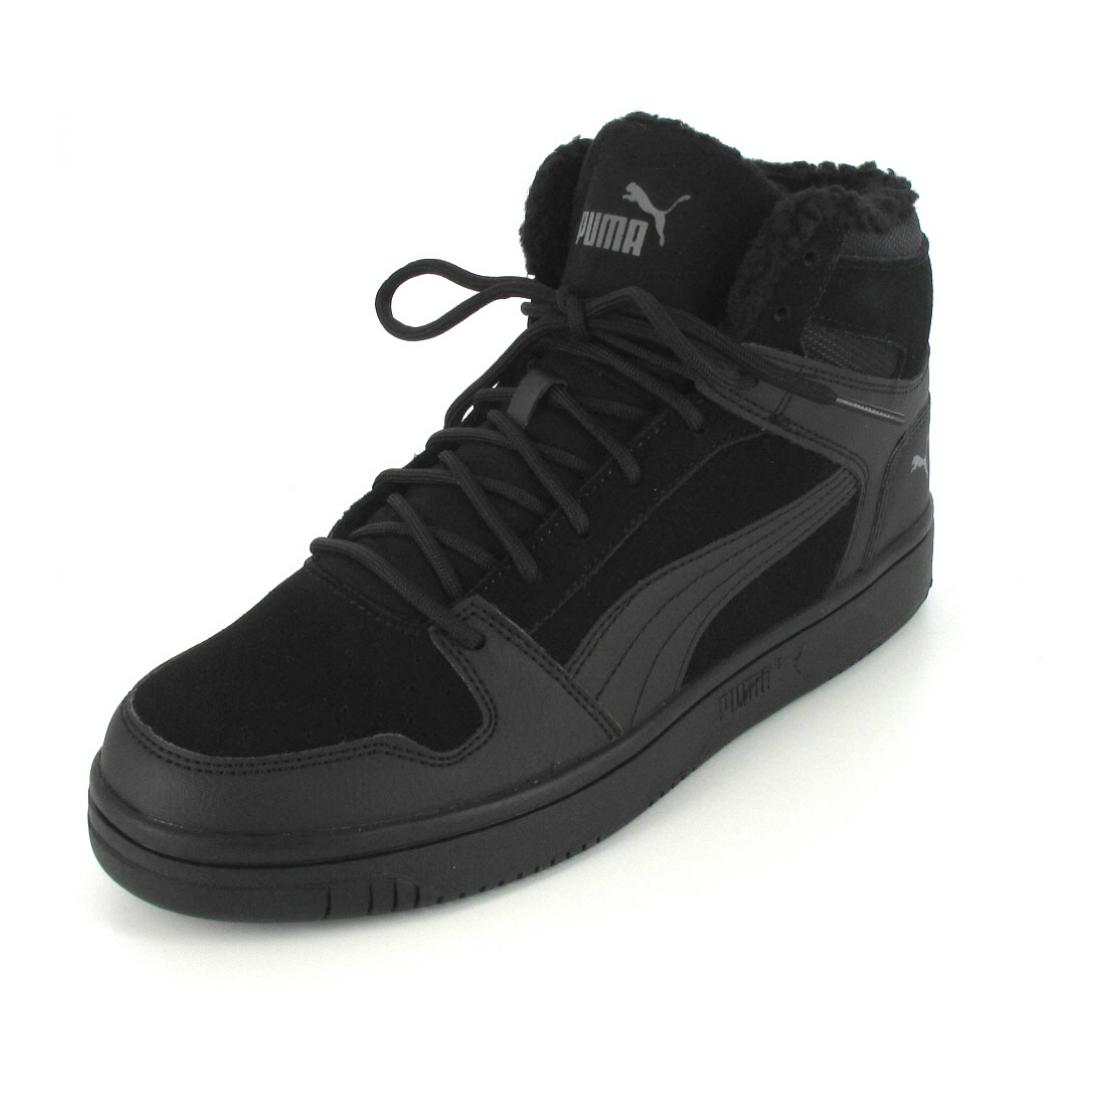 Puma Sneaker high Puma Rebound LayUp SD